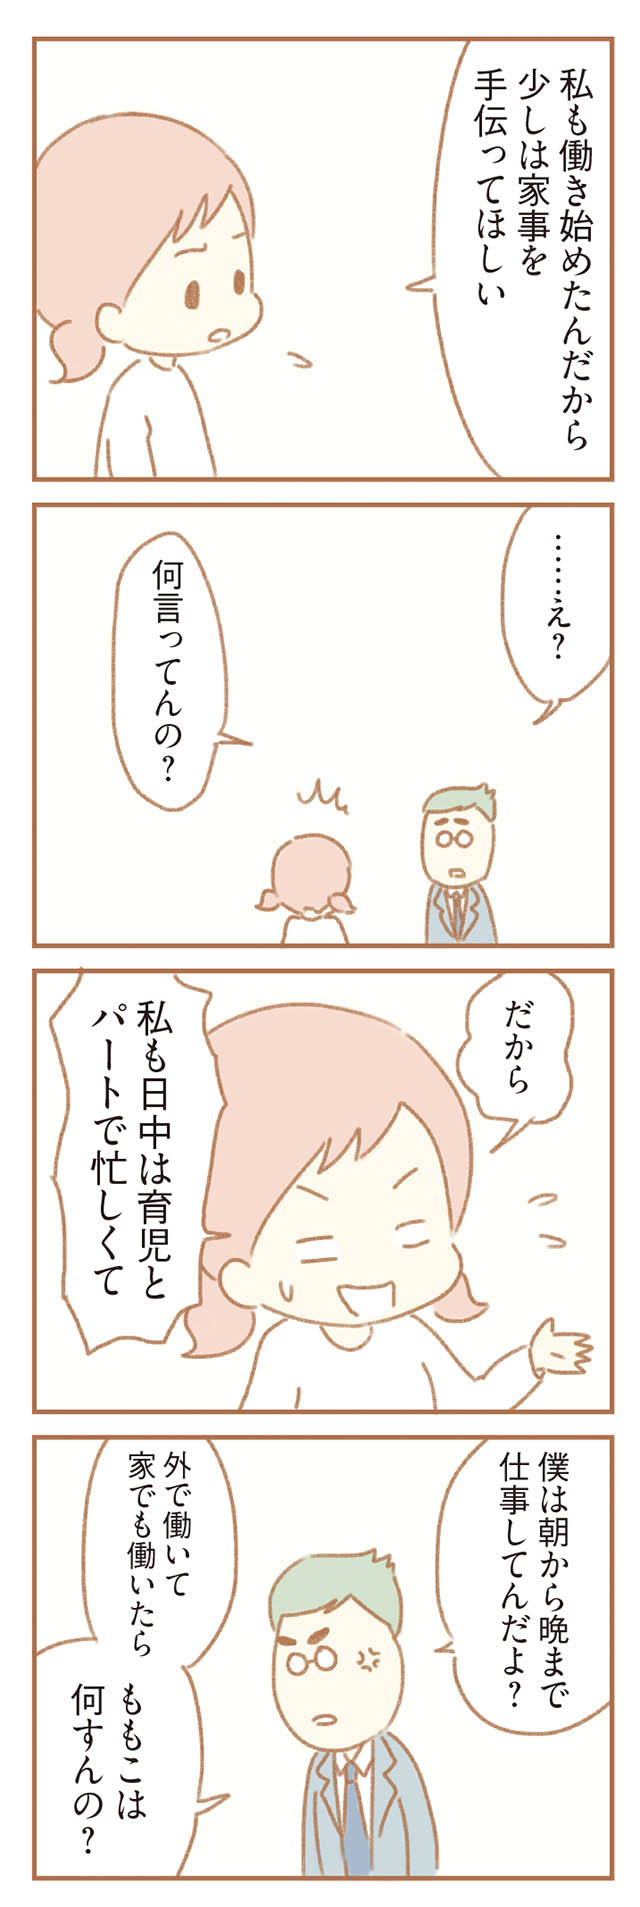 ottonohuyou_p11-2.jpg